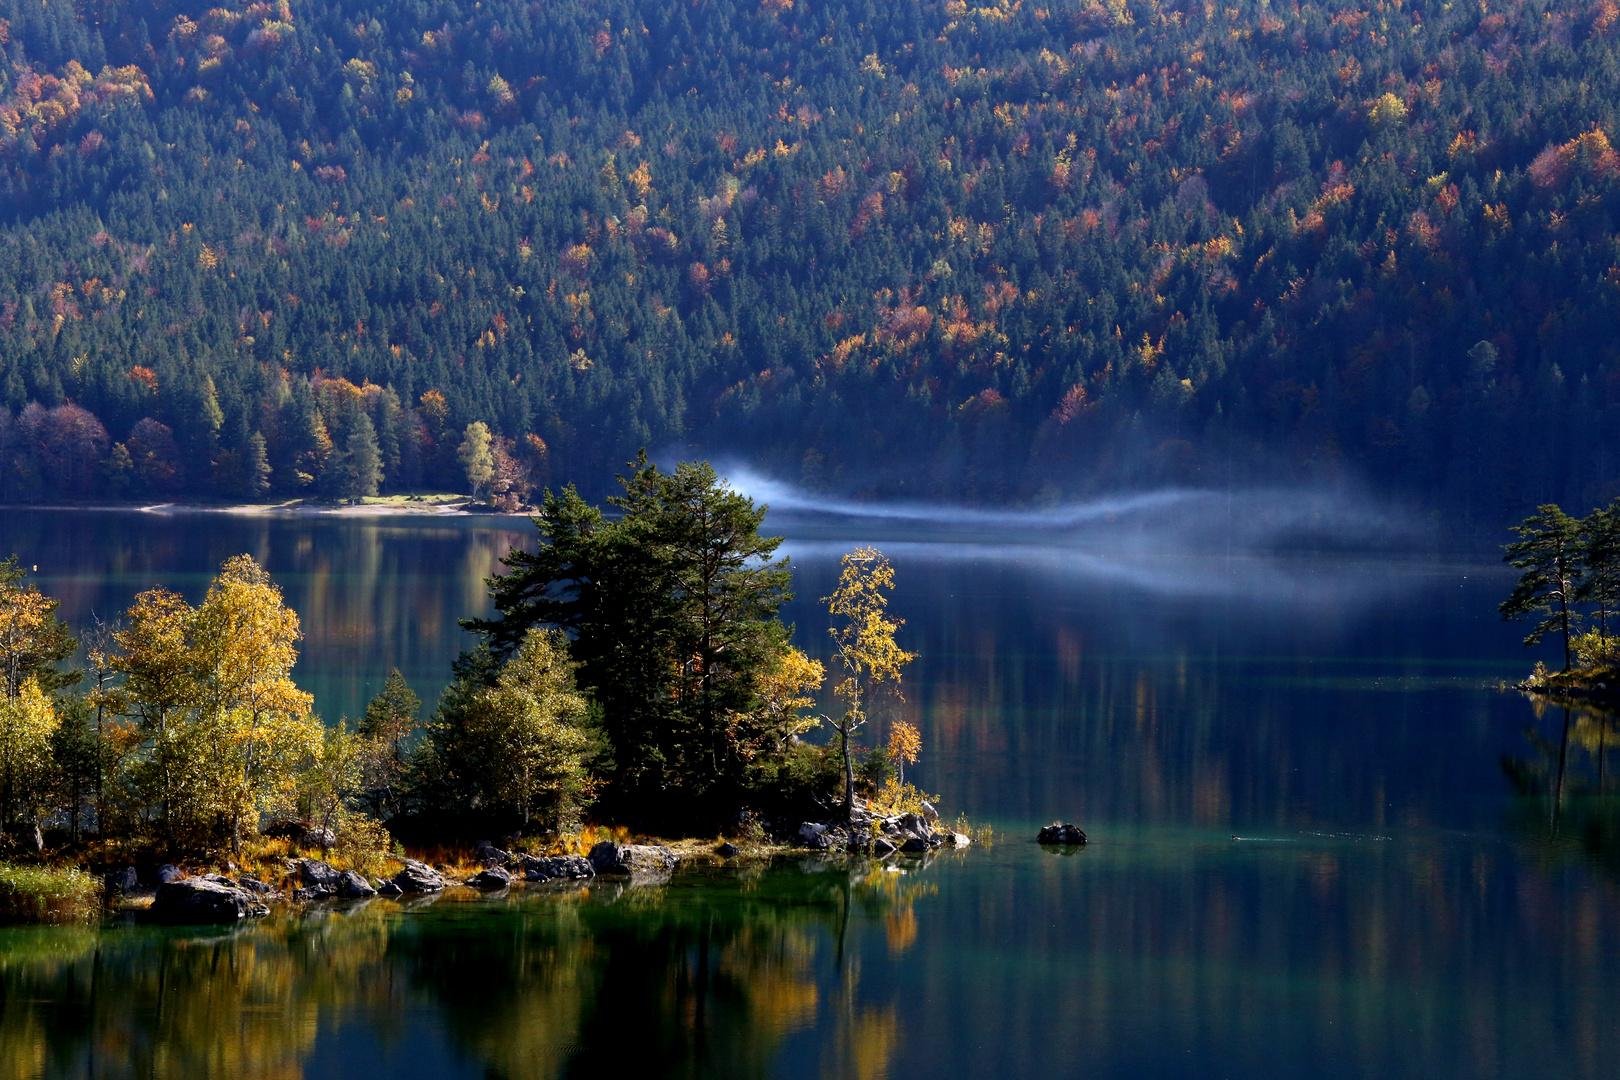 Herbst am Eibsee